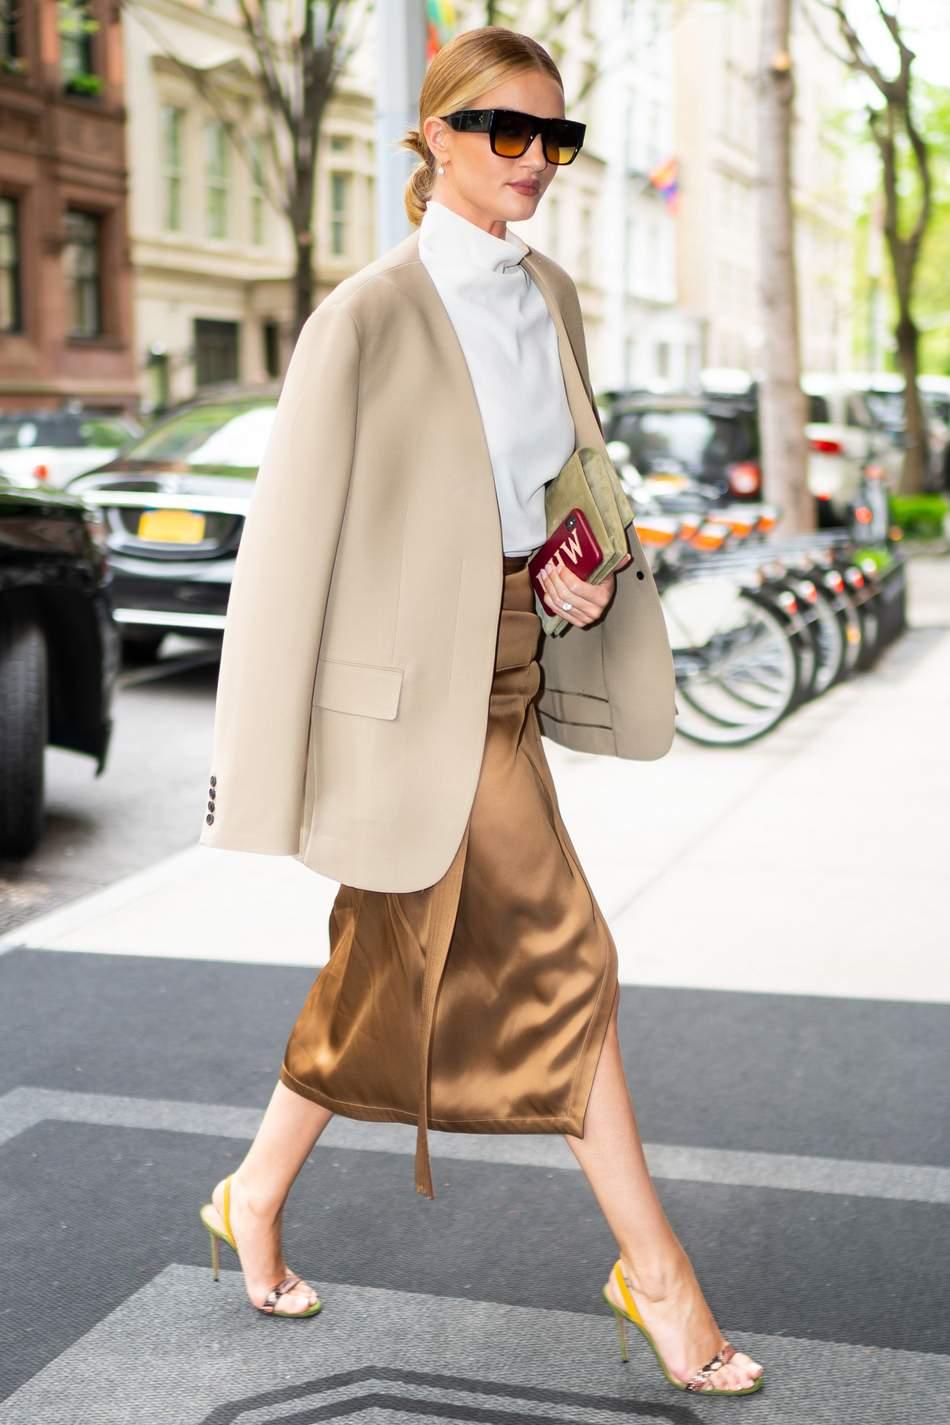 Rosie Huntington-Whiteley in NYC.jpeg